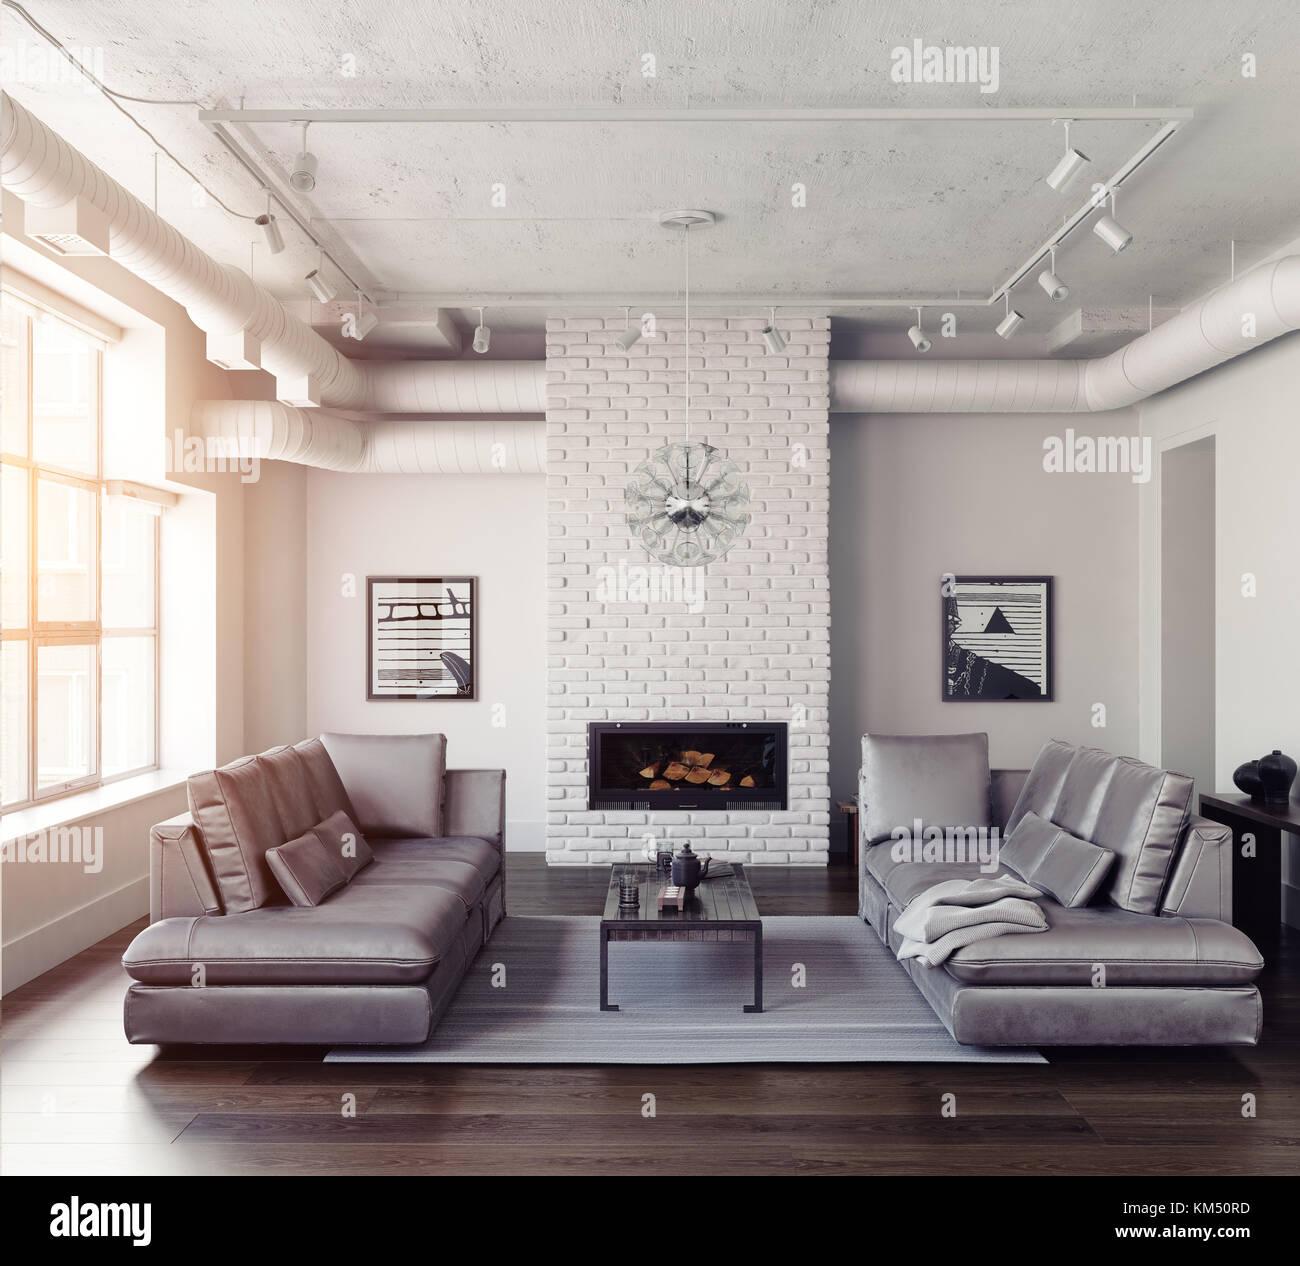 Interior Room Fireplace Sofa 3d Stockfotos & Interior Room Fireplace ...